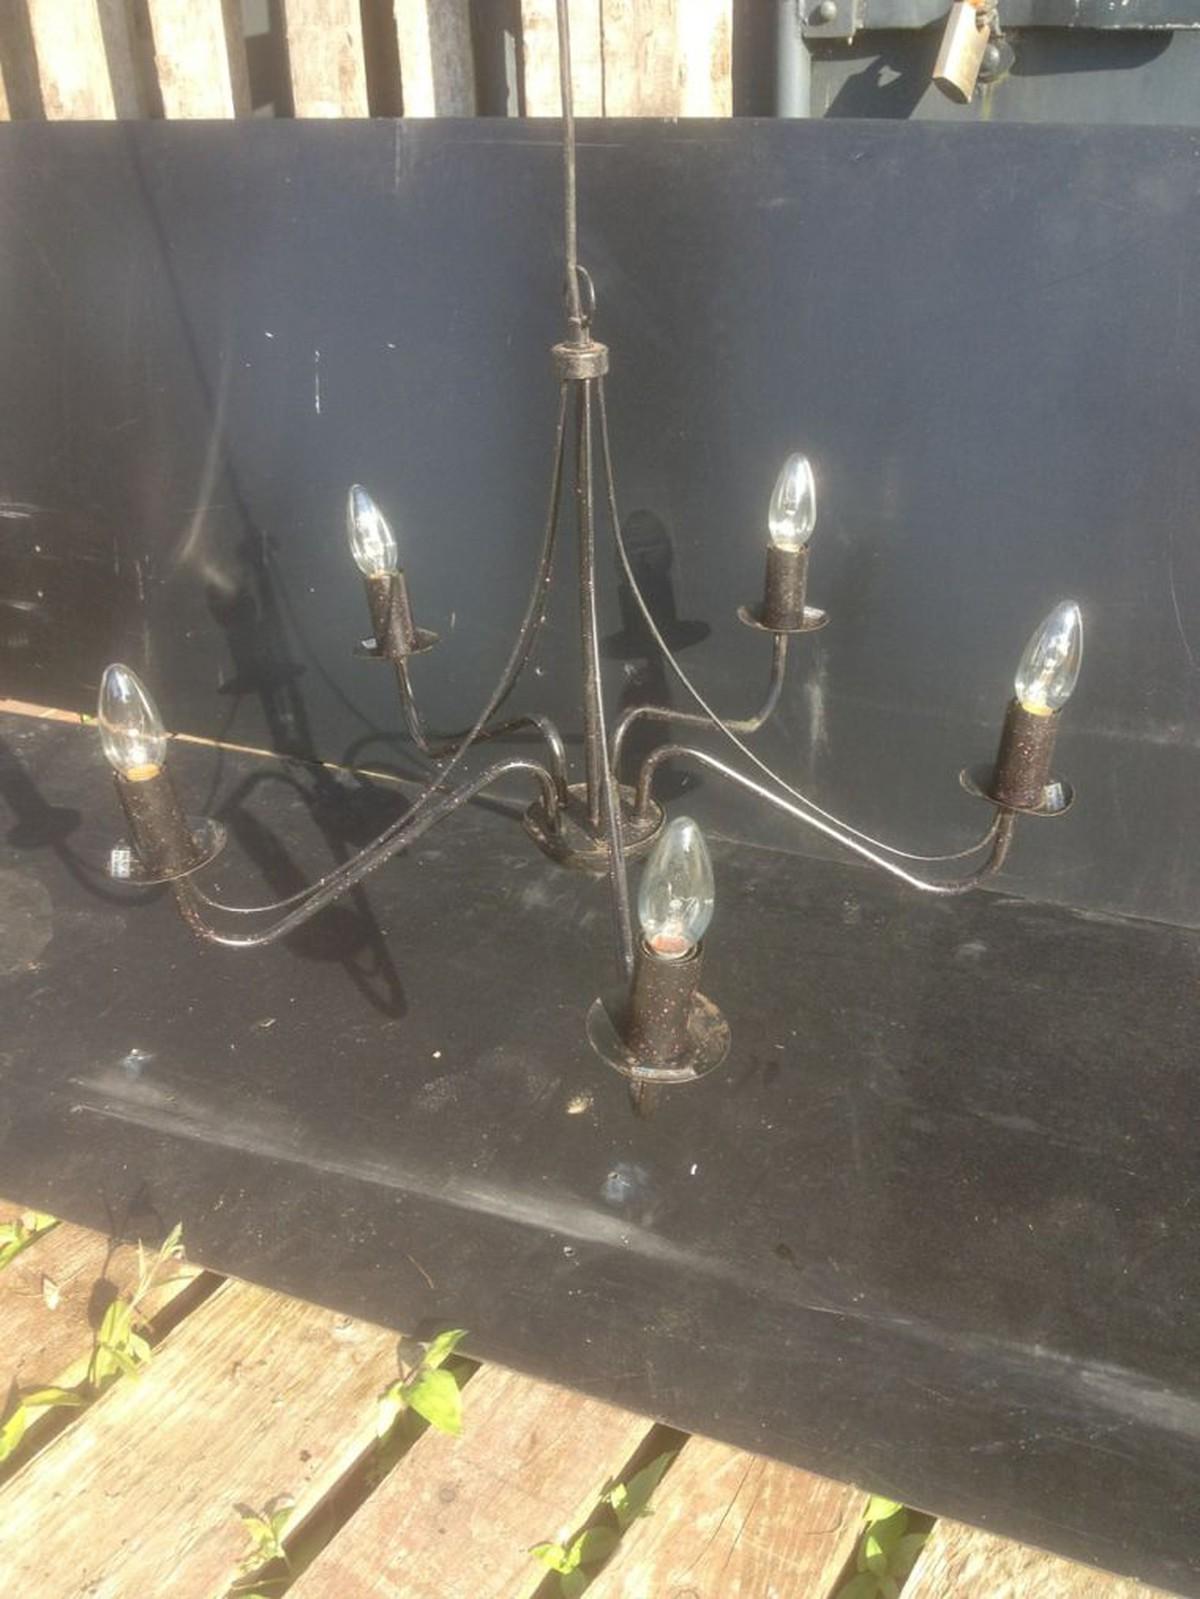 Secondhand prop shop gothic black chandeliers essex 5 arm chandelier aloadofball Choice Image